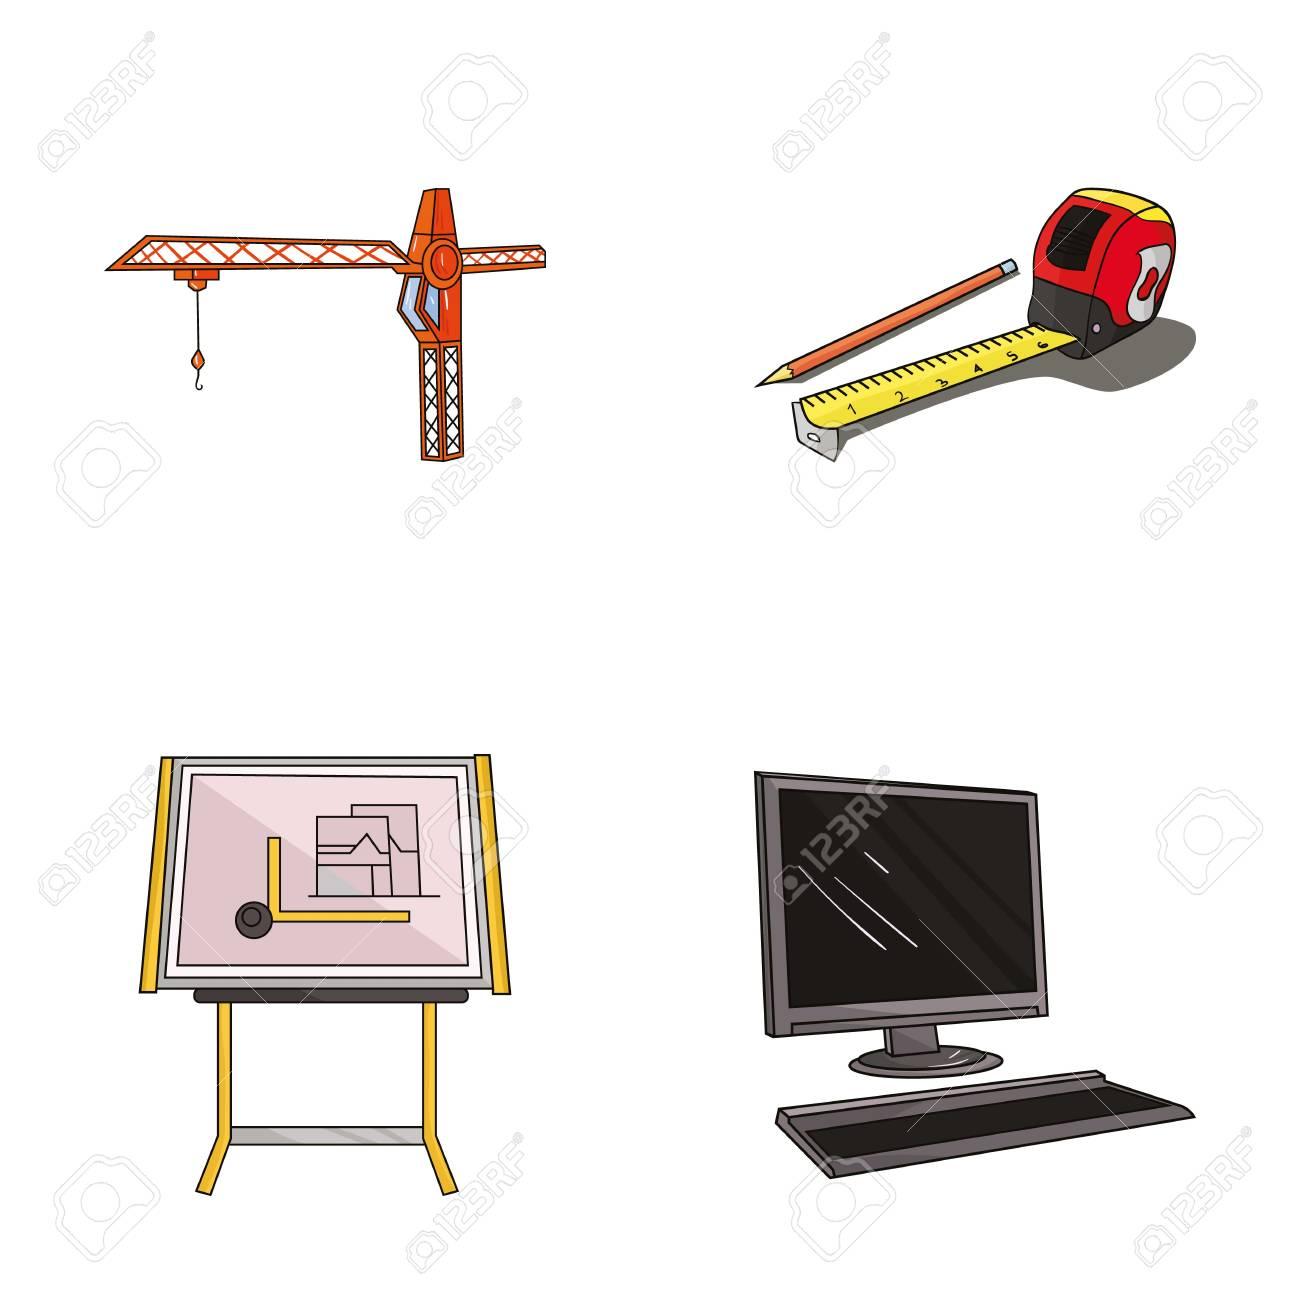 1300x1300 Construction Crane, Measuring Tape Measure, Drawing Board